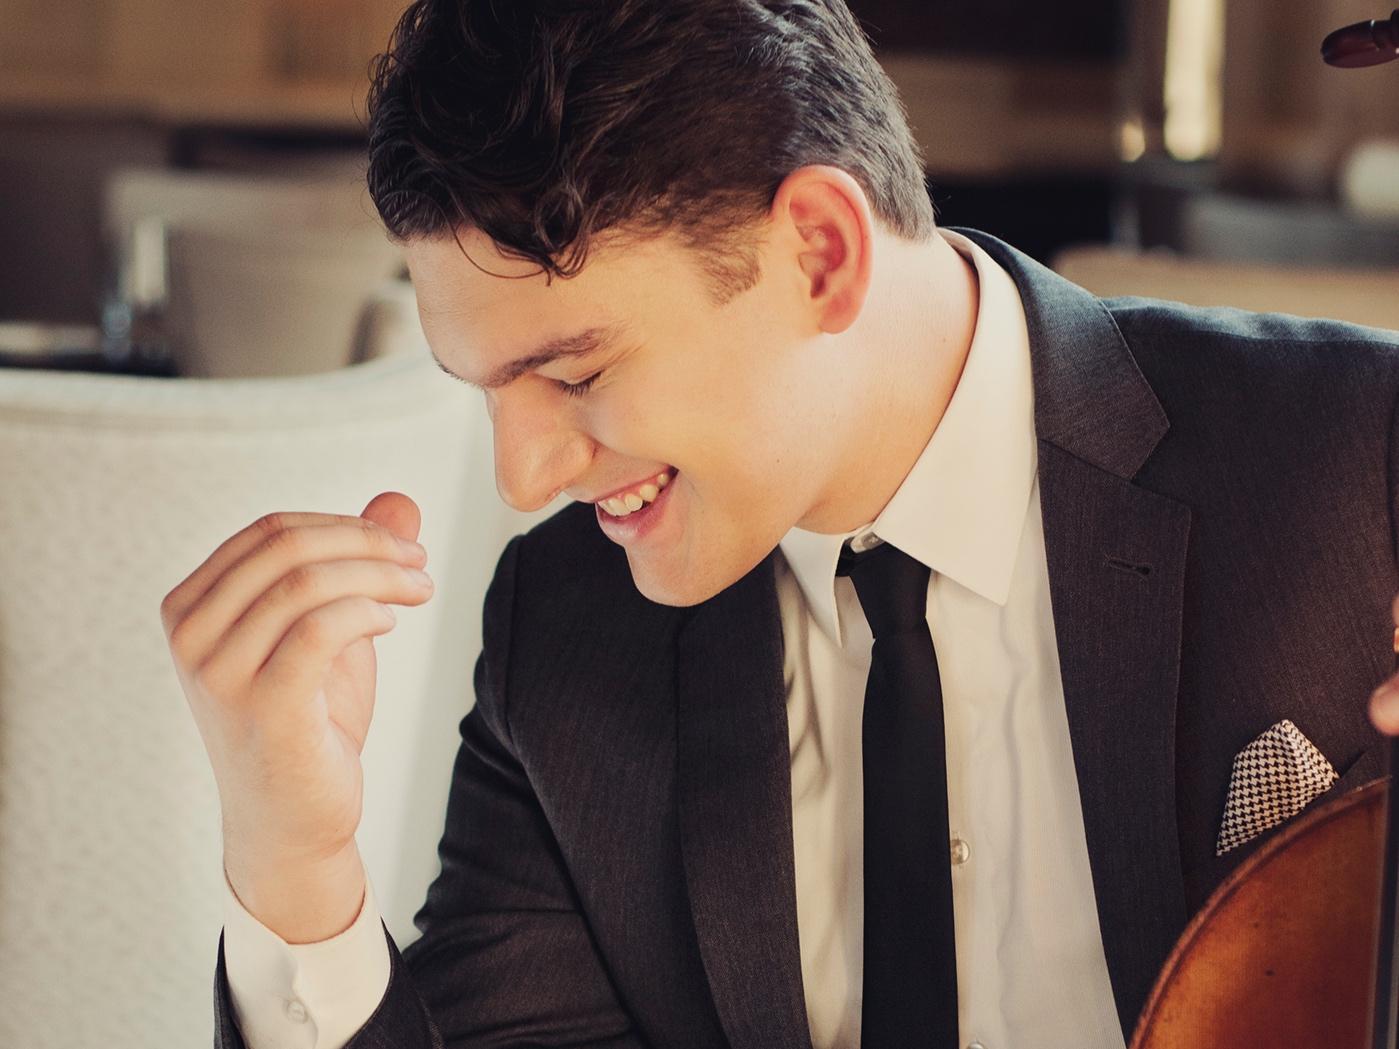 Gabriel-Cabezas-Cello-Candid_2.jpg